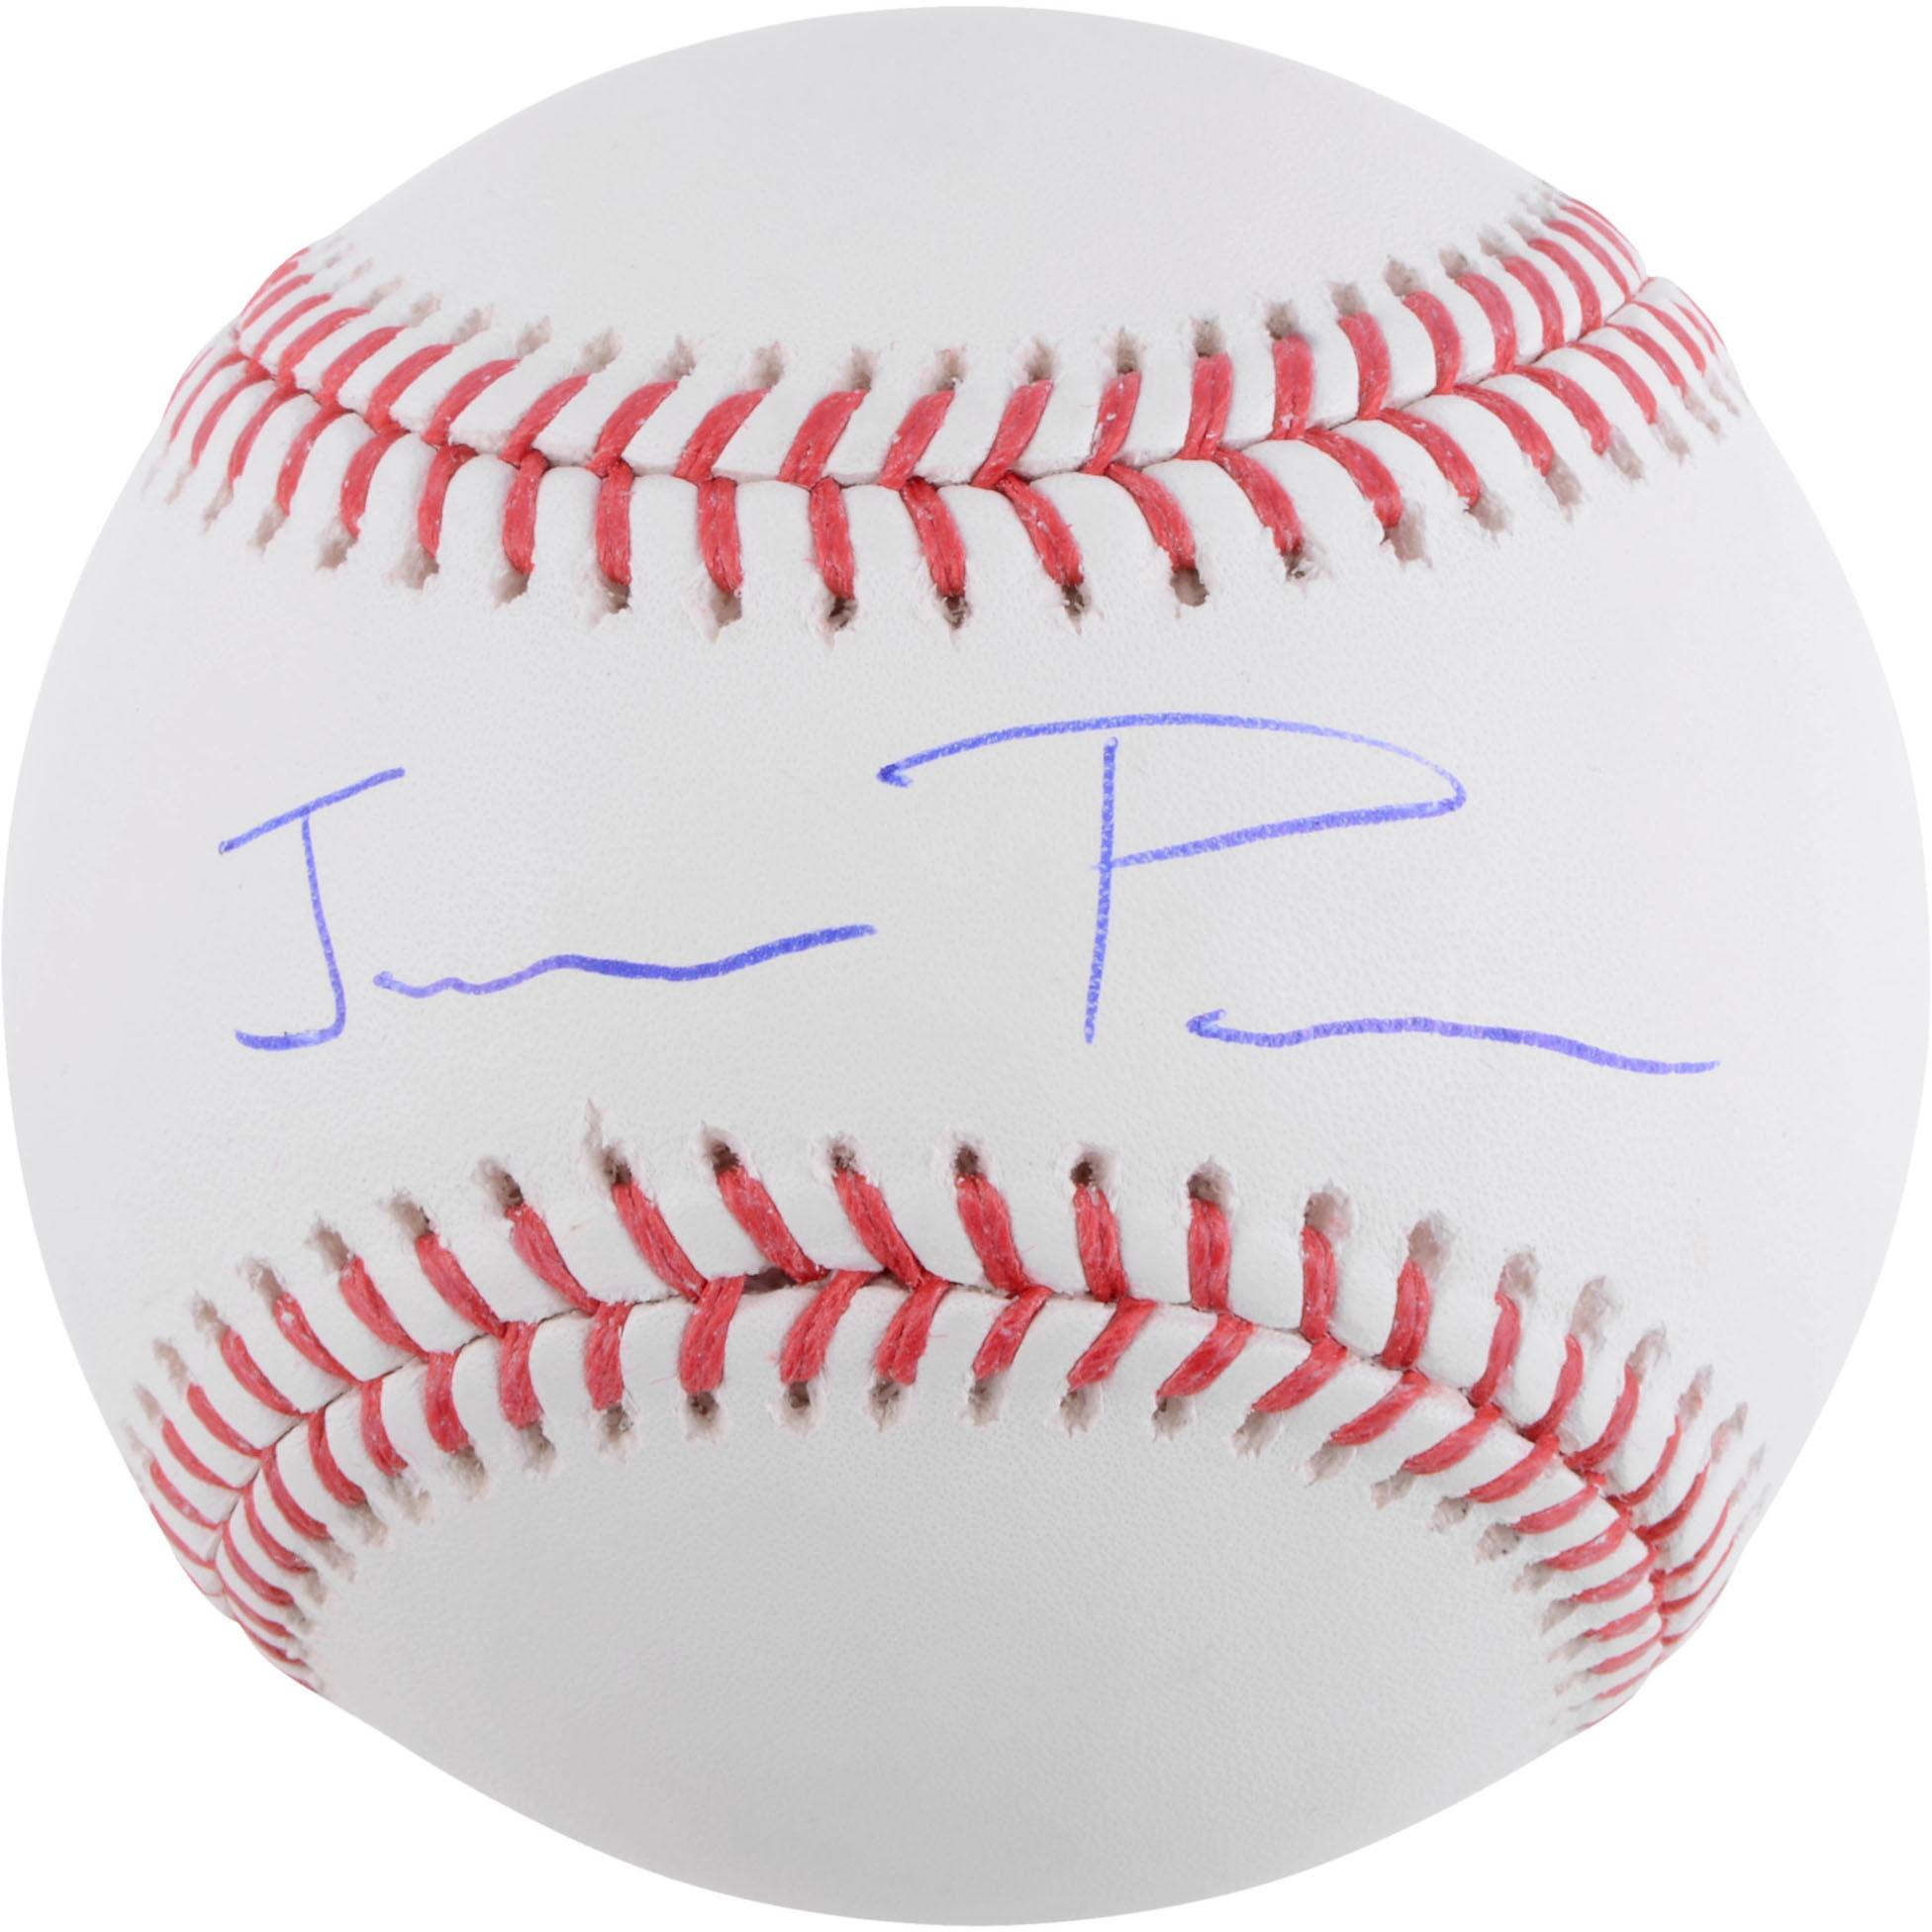 Jermaine Palacios Minnesota Twins Autographed Baseball - Fanatics Authentic Certified